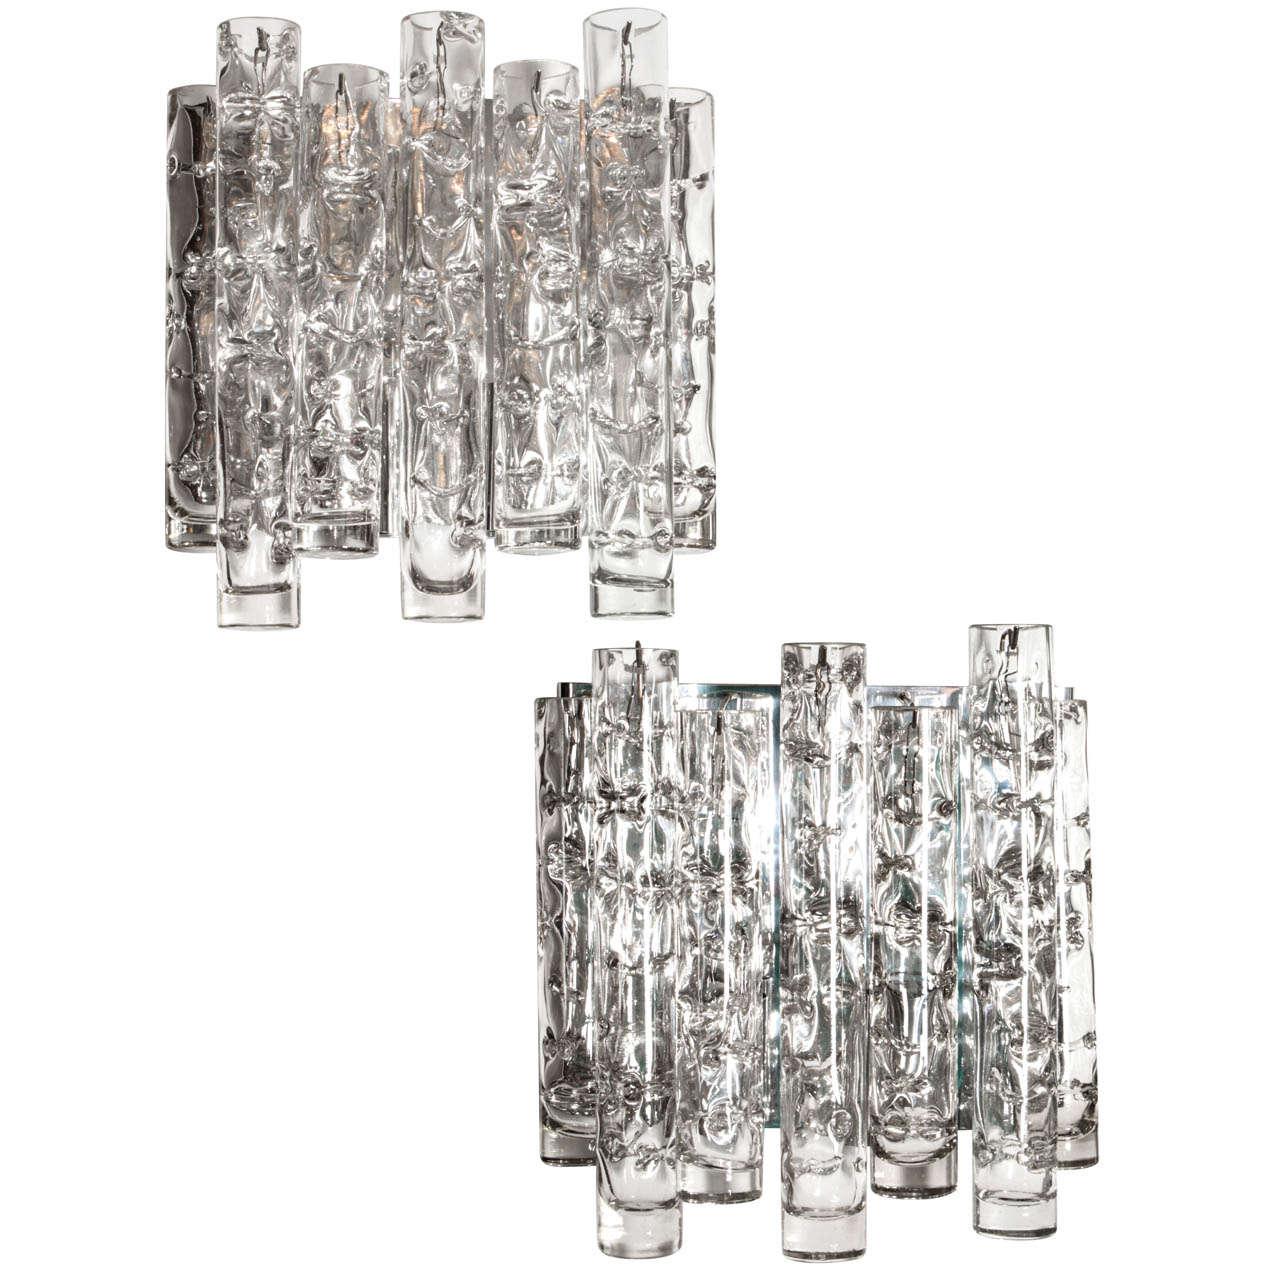 Pair of Glass Sconces by Doria